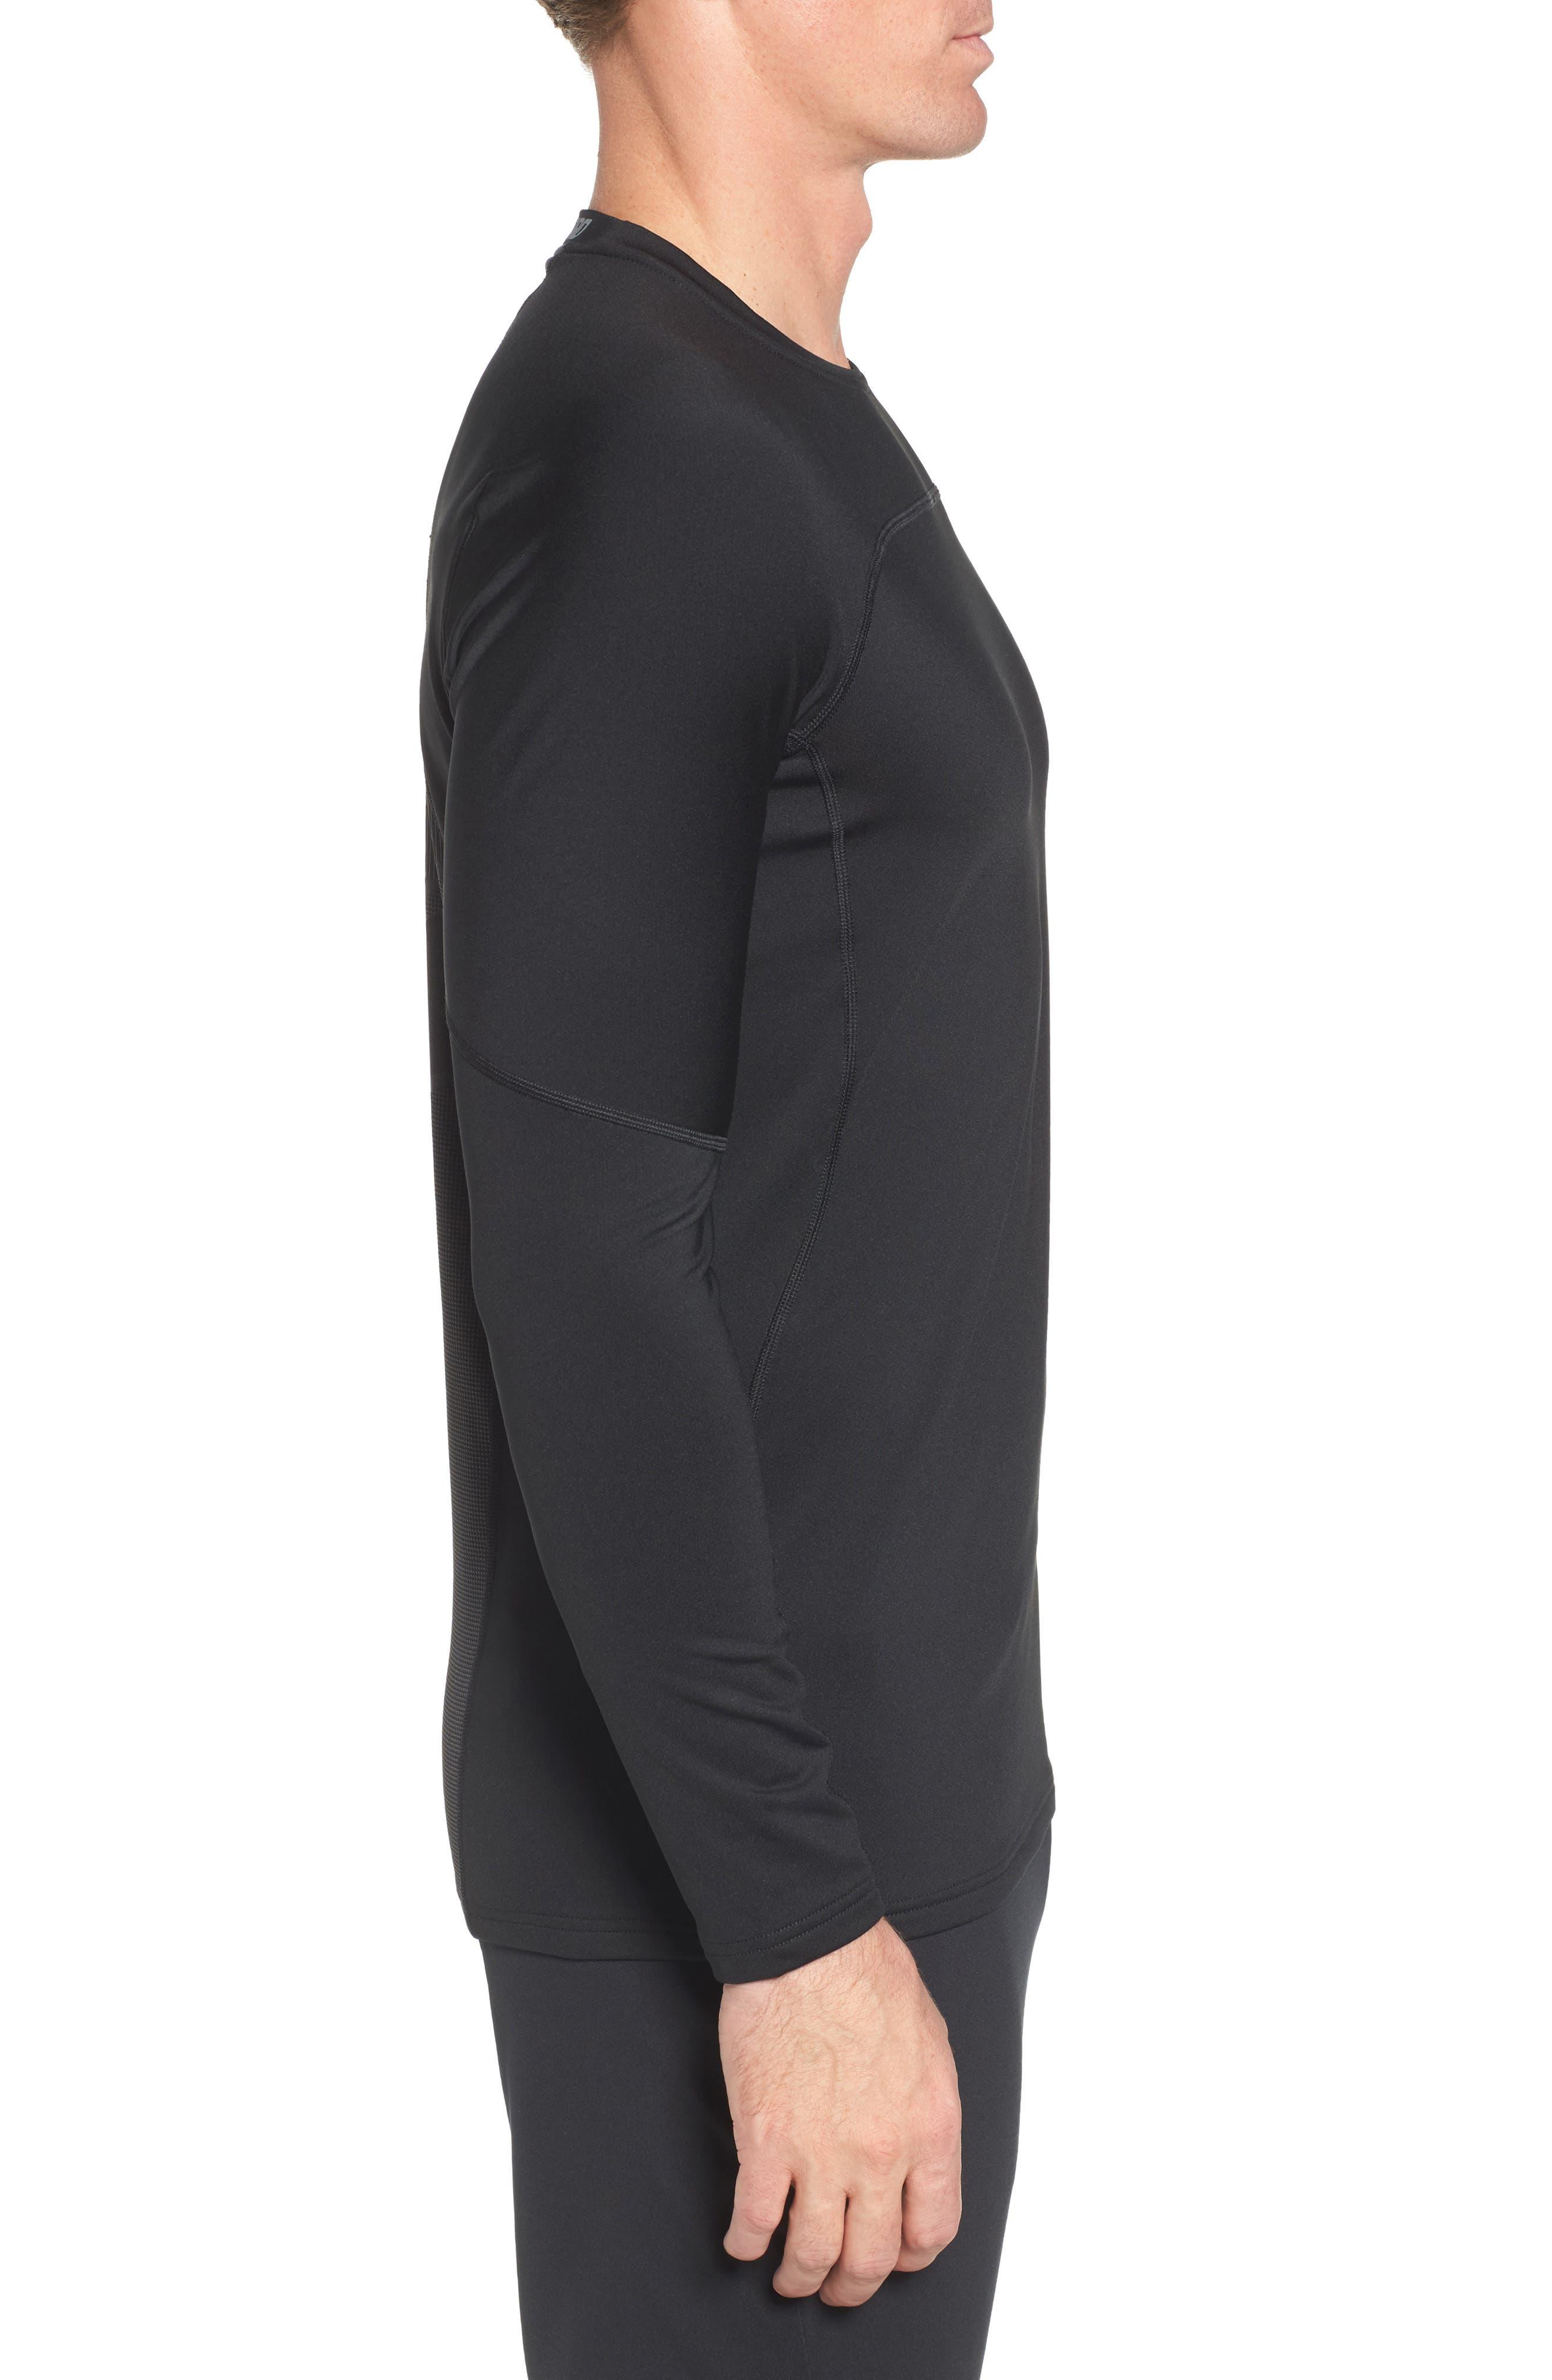 Pro Long Sleeve Training T-Shirt,                             Alternate thumbnail 3, color,                             Black/ Cool Grey/ Cool Grey